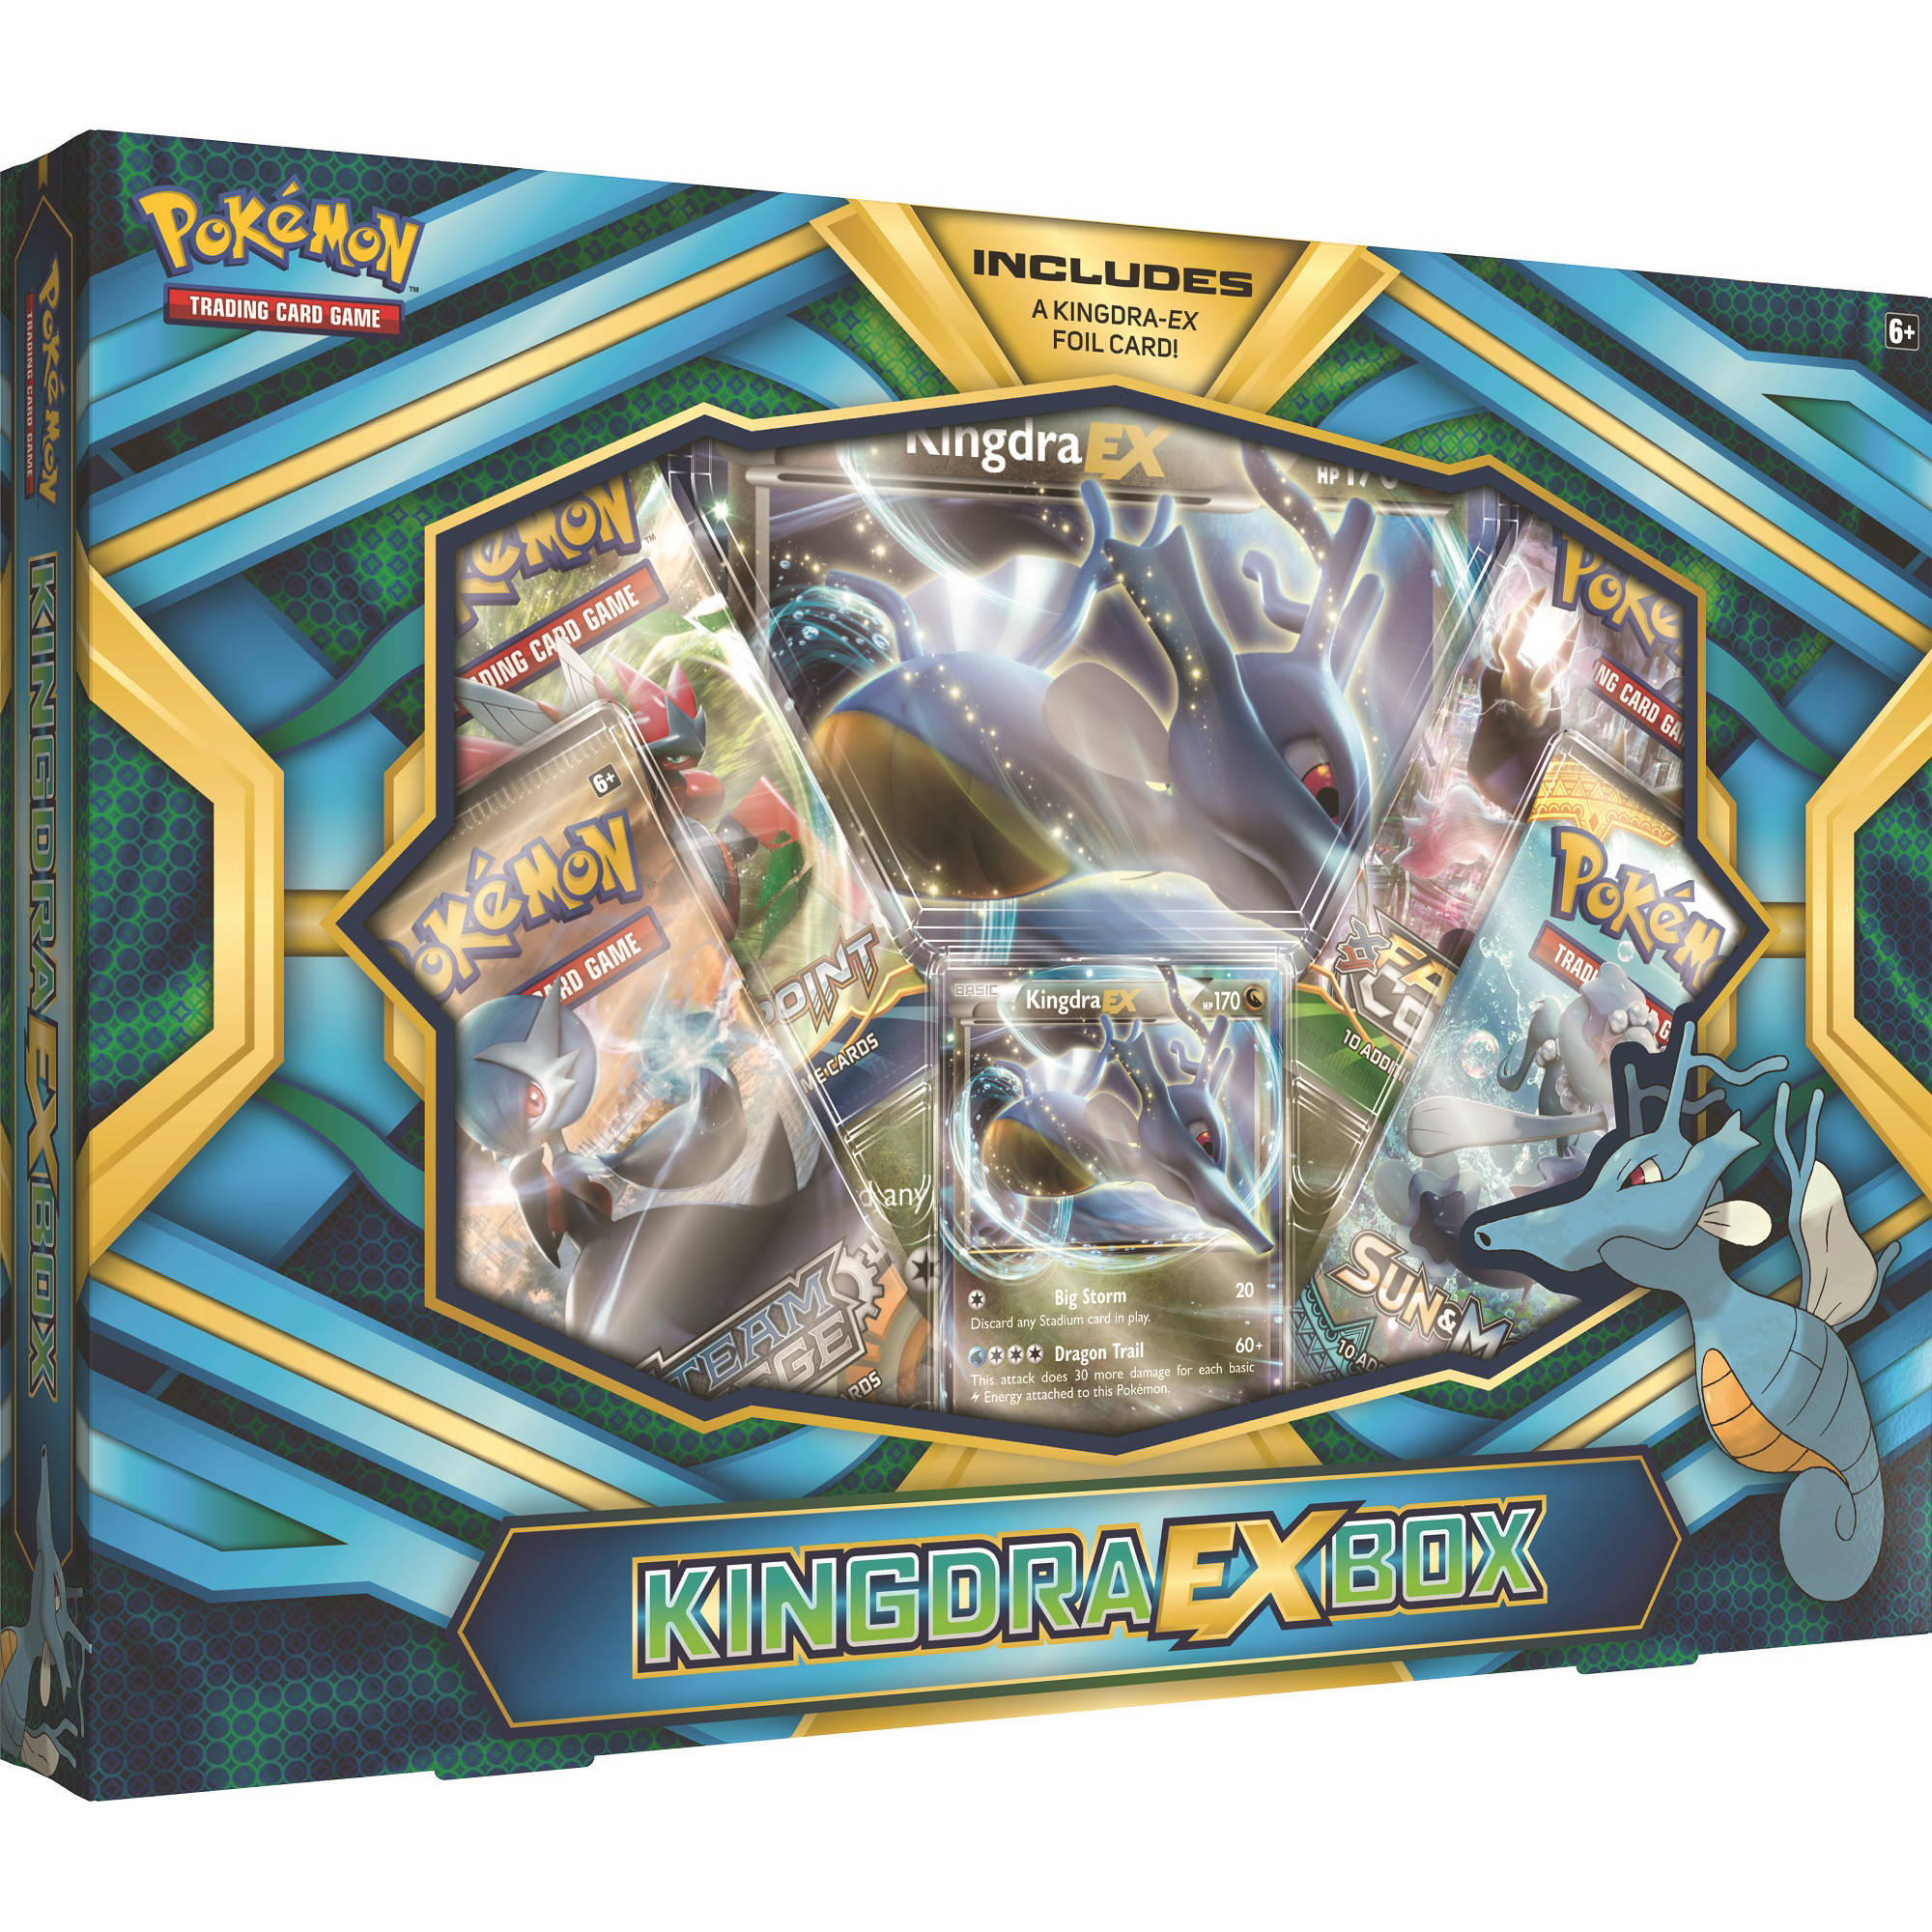 Pokemon Kingdra EX Box by Pokemon